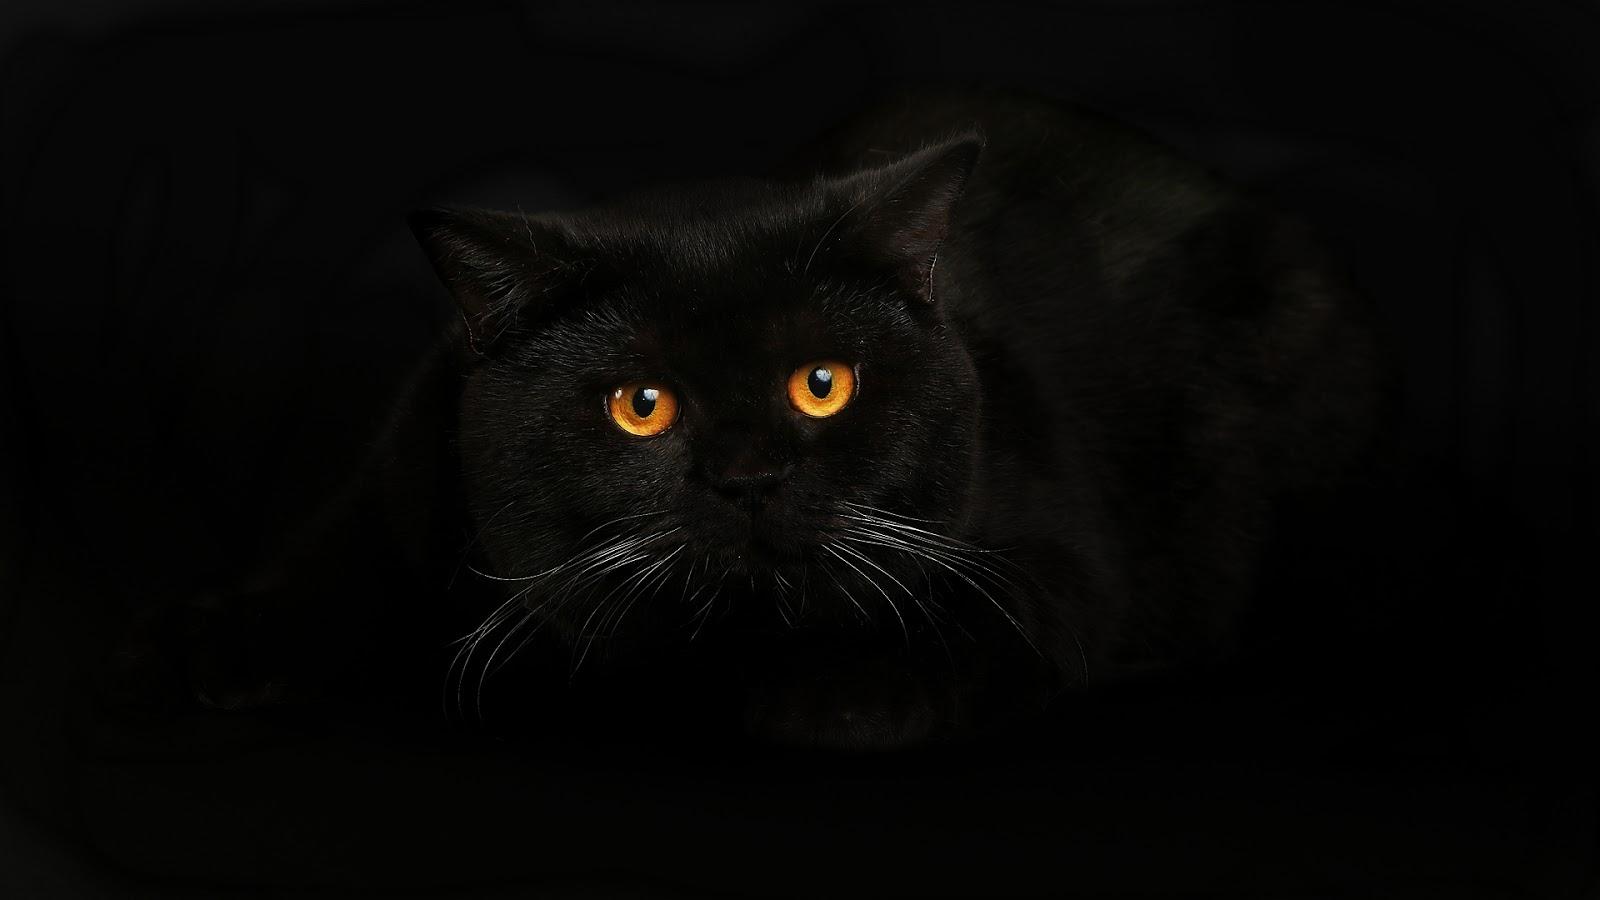 Black Cat Wallpaper - Best HD Wallpapers